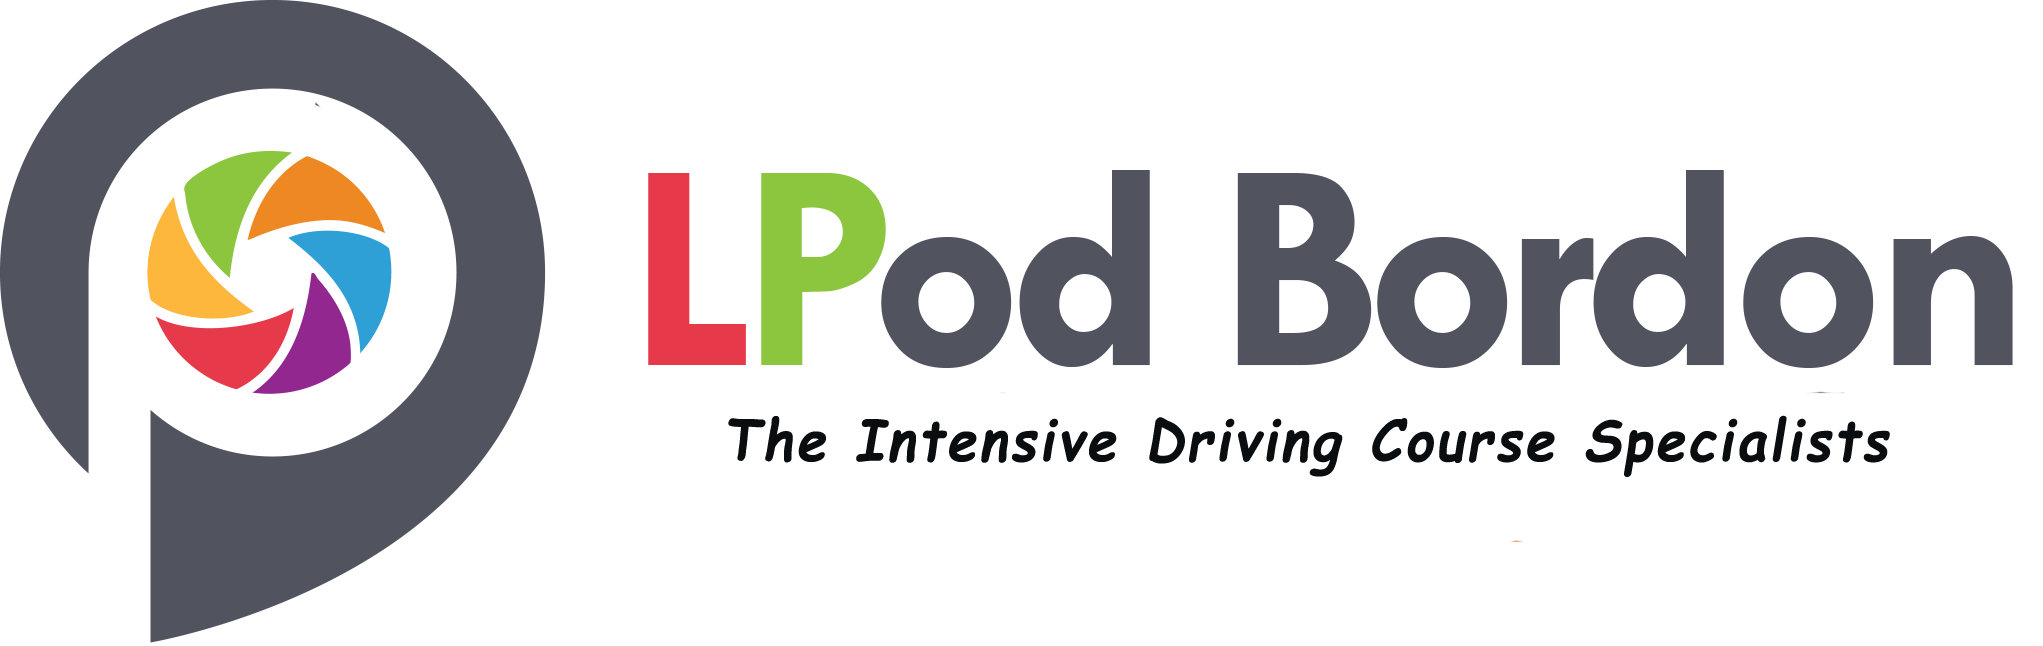 intensive driving courses Bordon, one week driving courses Bordon, crash driving courses Bordon, LPOD Academy Bordon